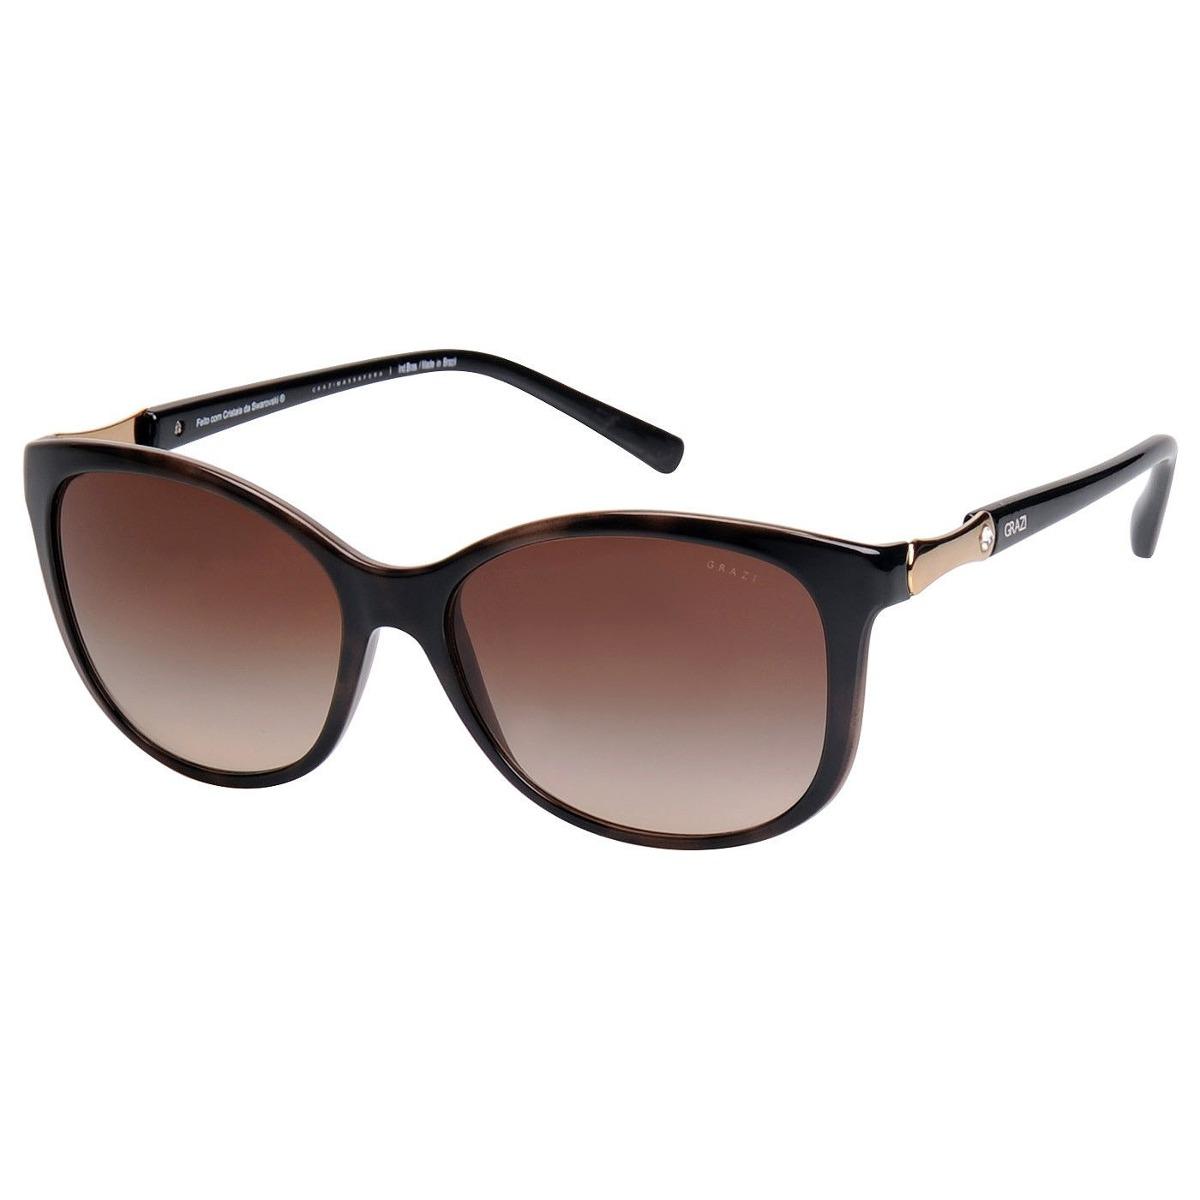 1a99dd2cc4fac óculos de sol feminino grazi massafera gz4015b f348. Carregando zoom.